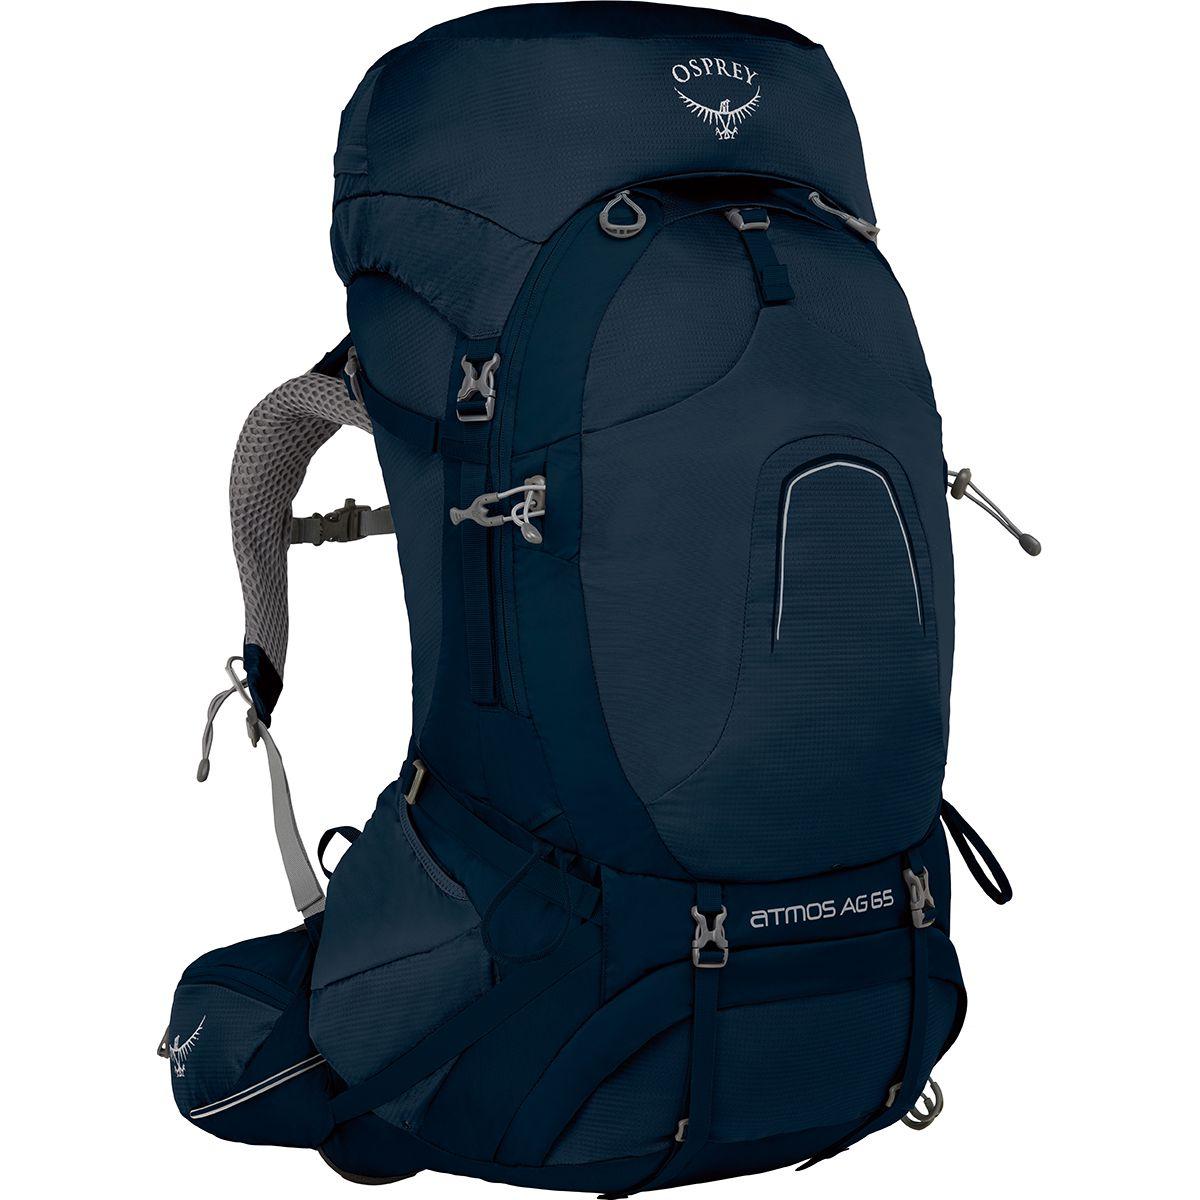 (Outdoorbroker) Osprey Atmos AG 65 (Trekking-) Rucksack